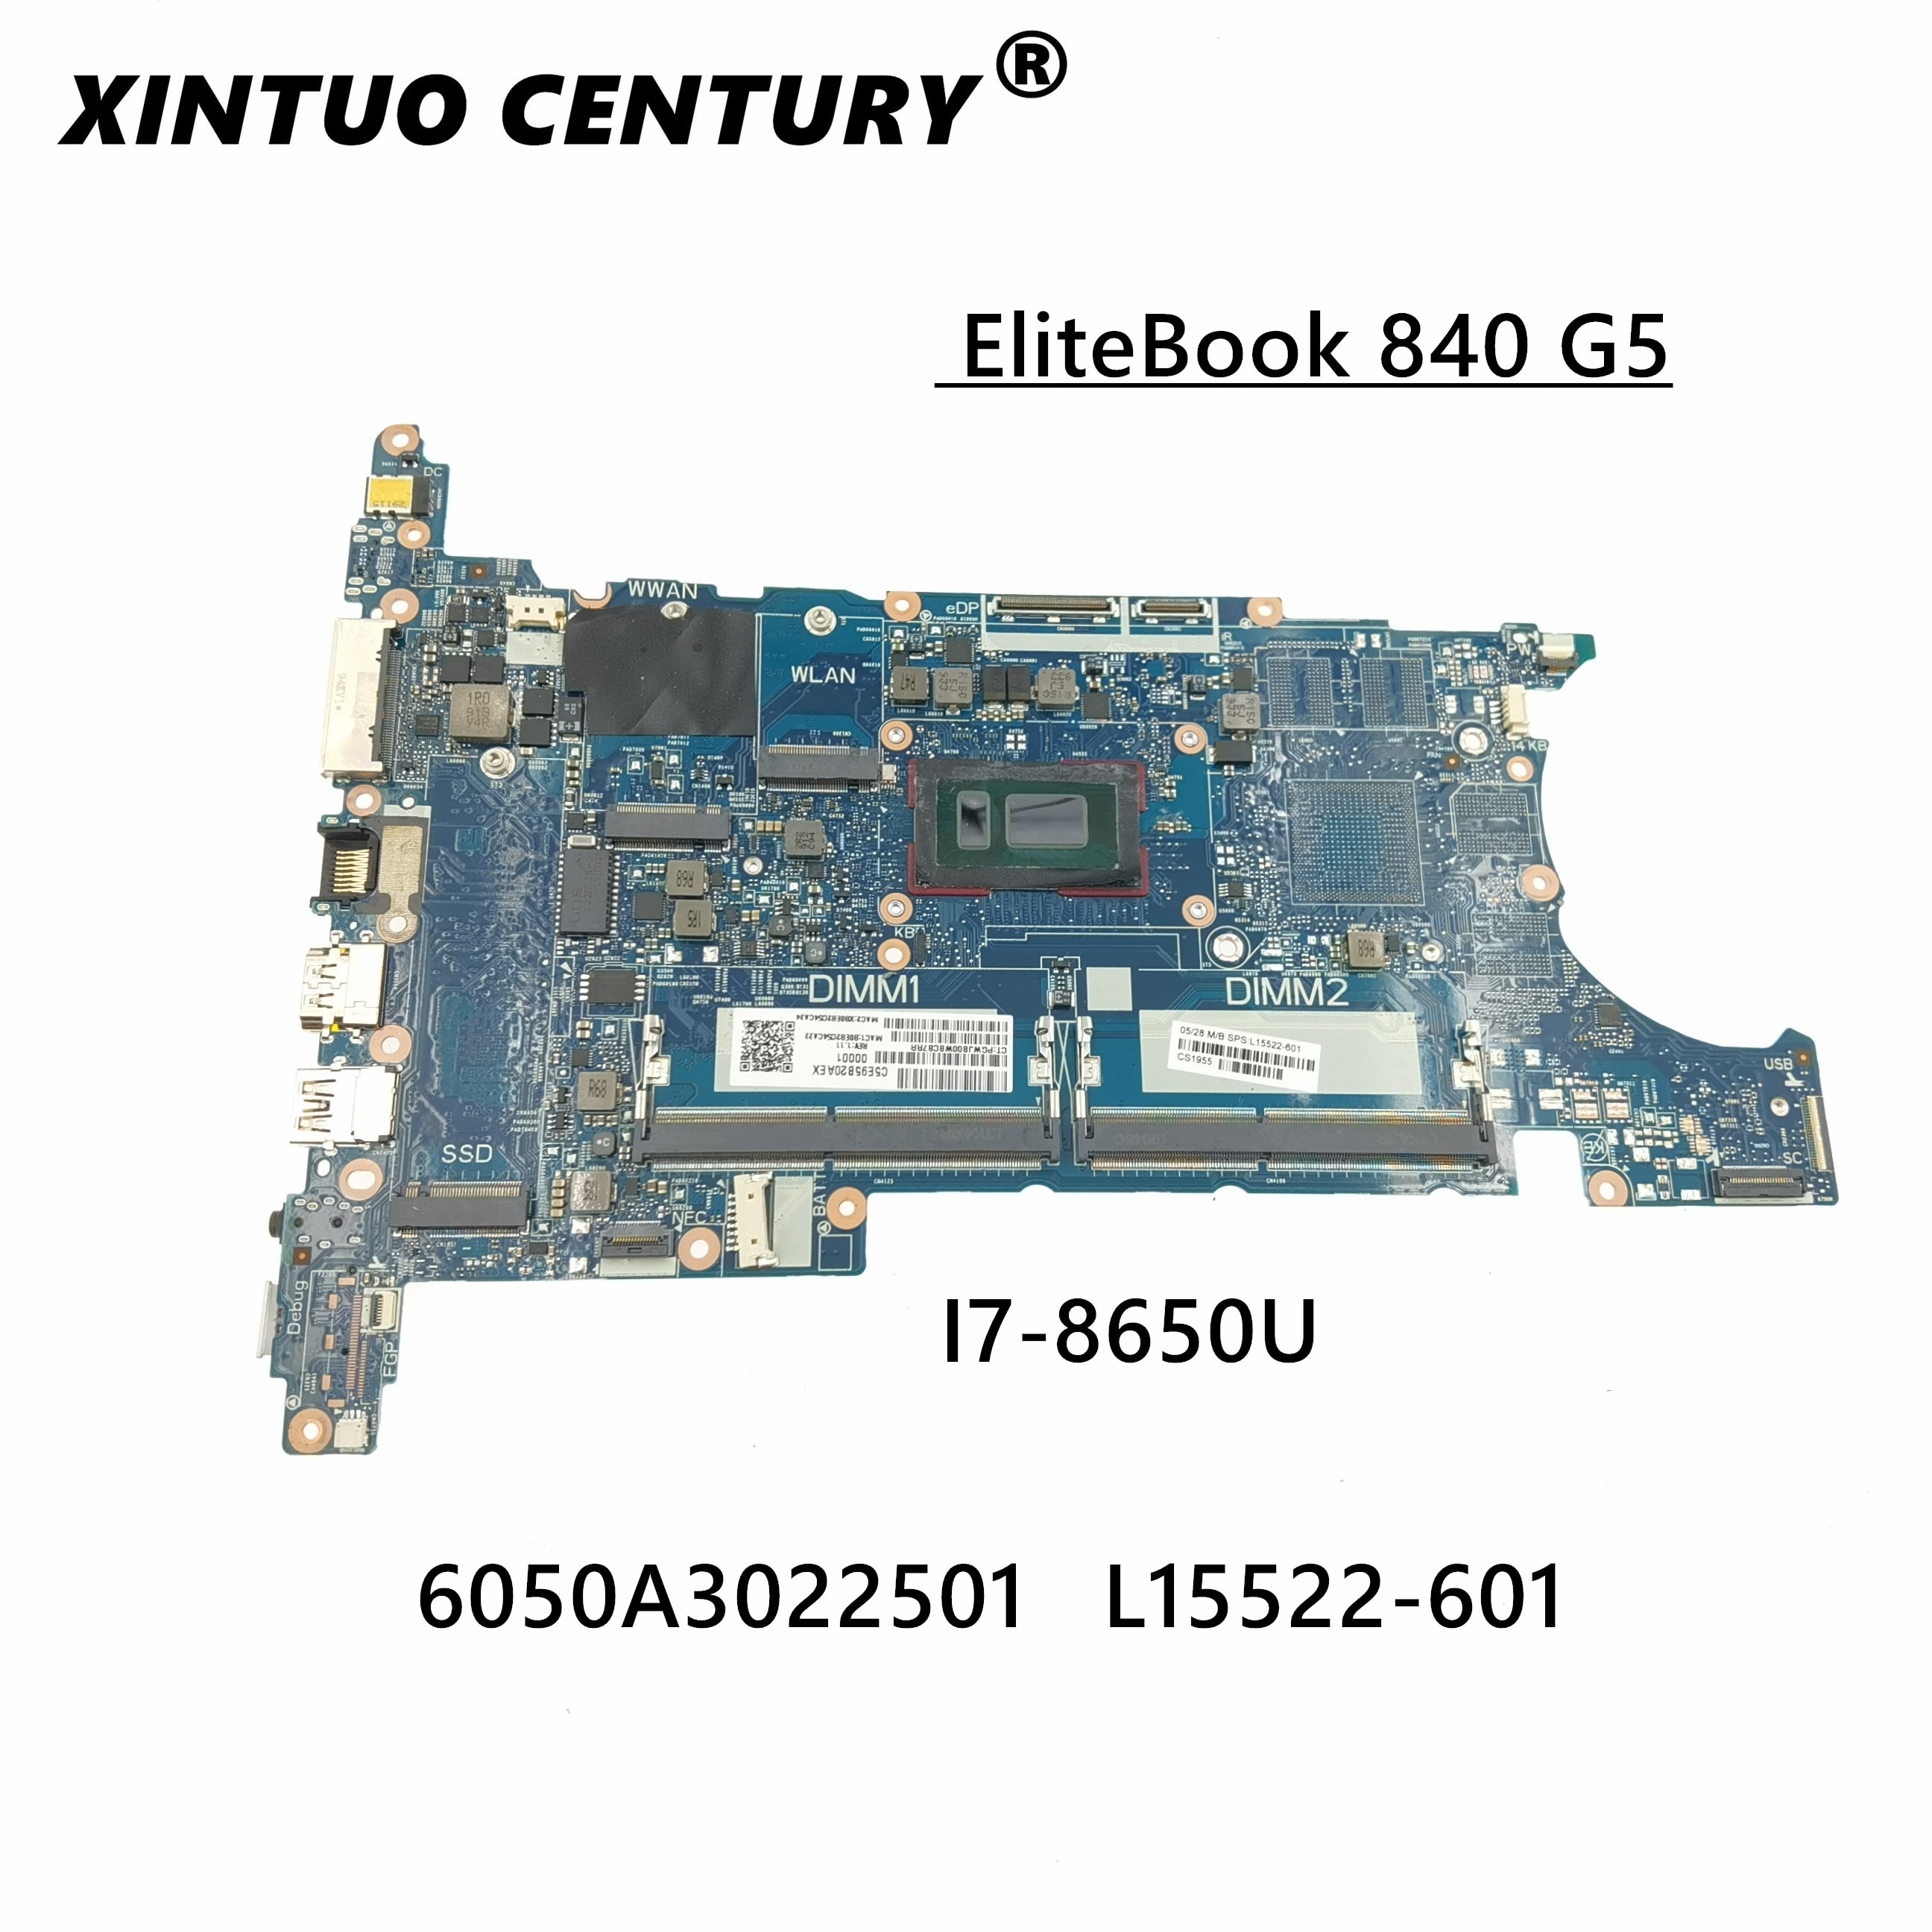 ل HP بي EliteBook 840 G5 i7-8650U اللوحة L15522-001 L15522-601 6050A3022501 100% اختبار بالكامل